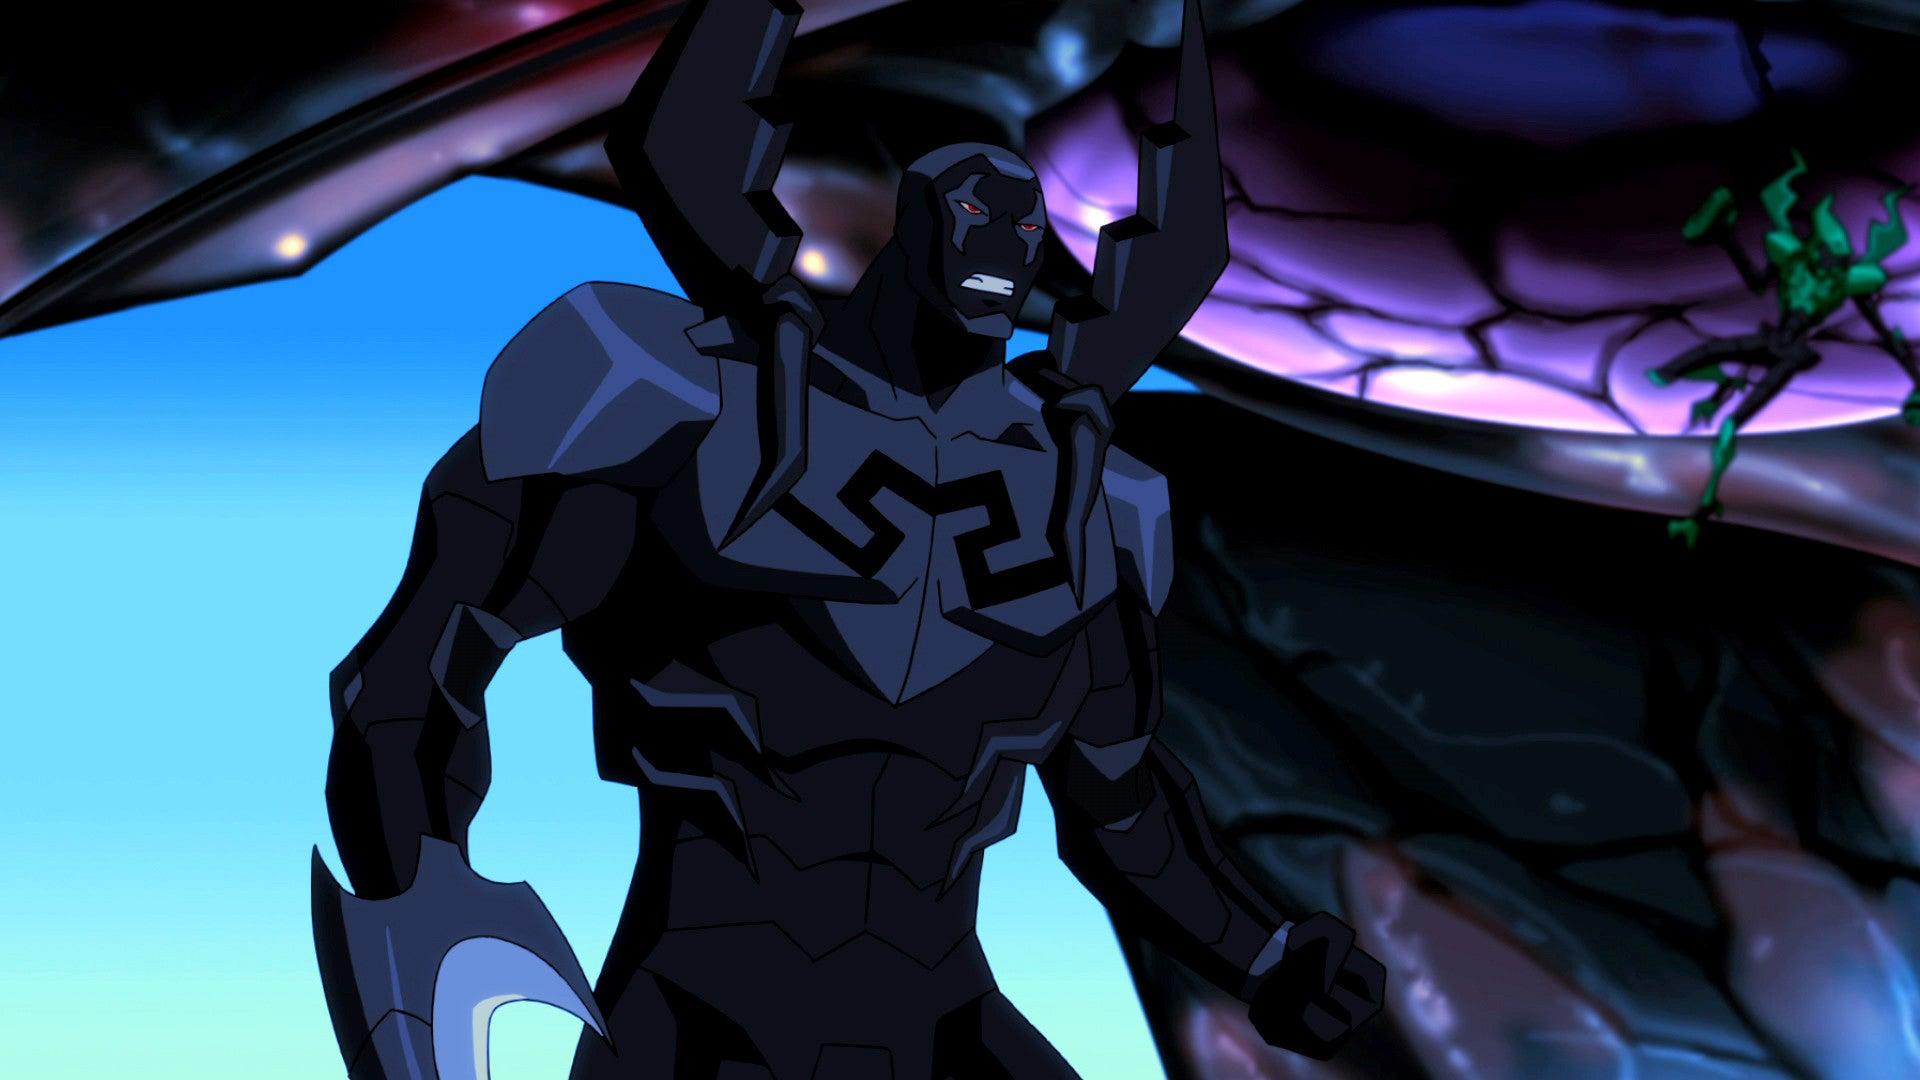 godzilla vs black beetle (young justice)   SpaceBattles Forums  godzilla vs bla...